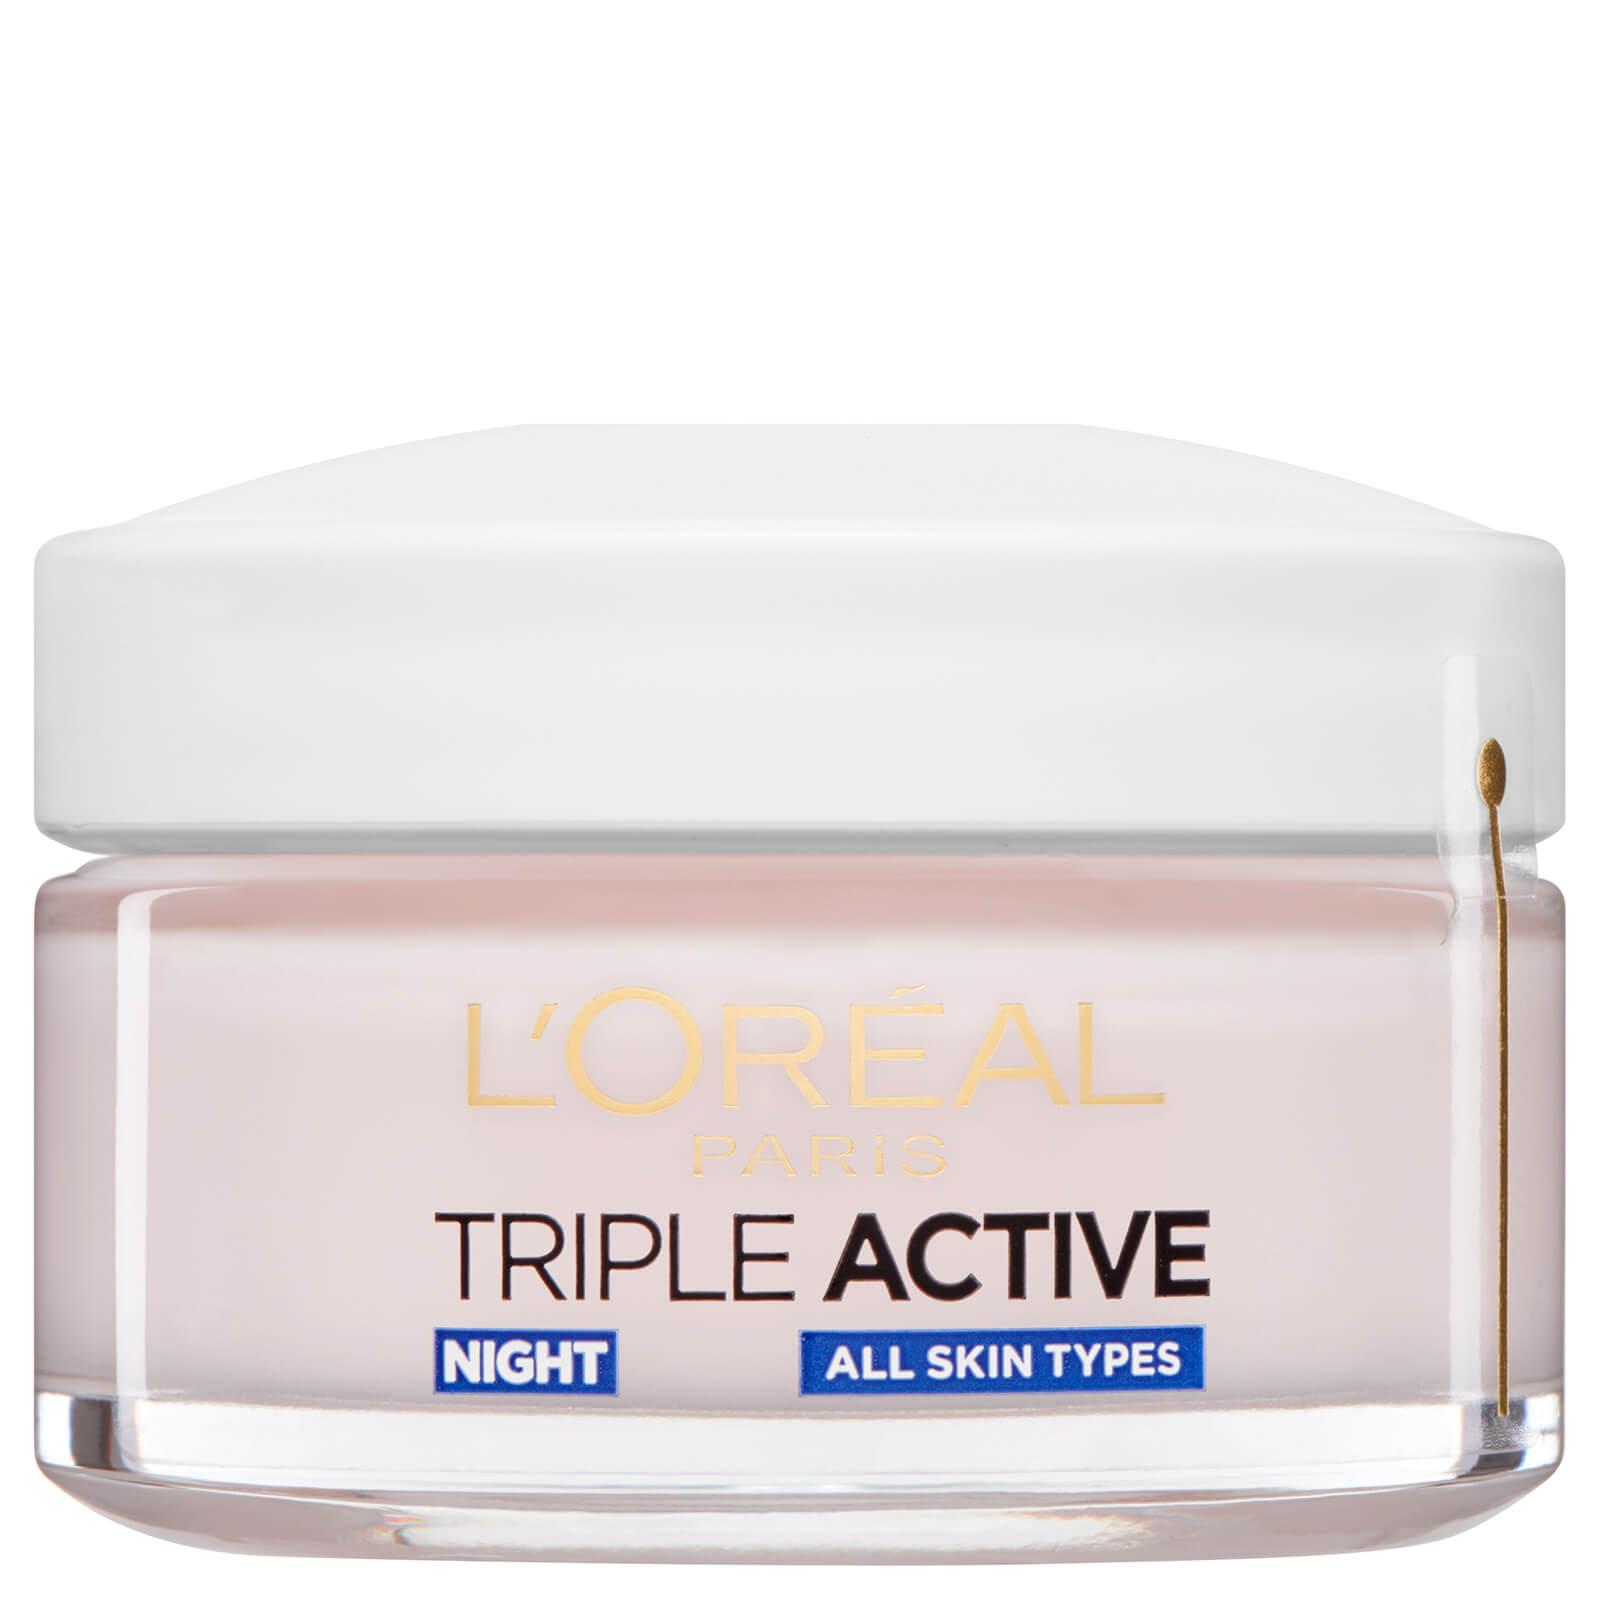 l'oreal paris dermo expertise triple active hydrating night moisturizer (50ml)